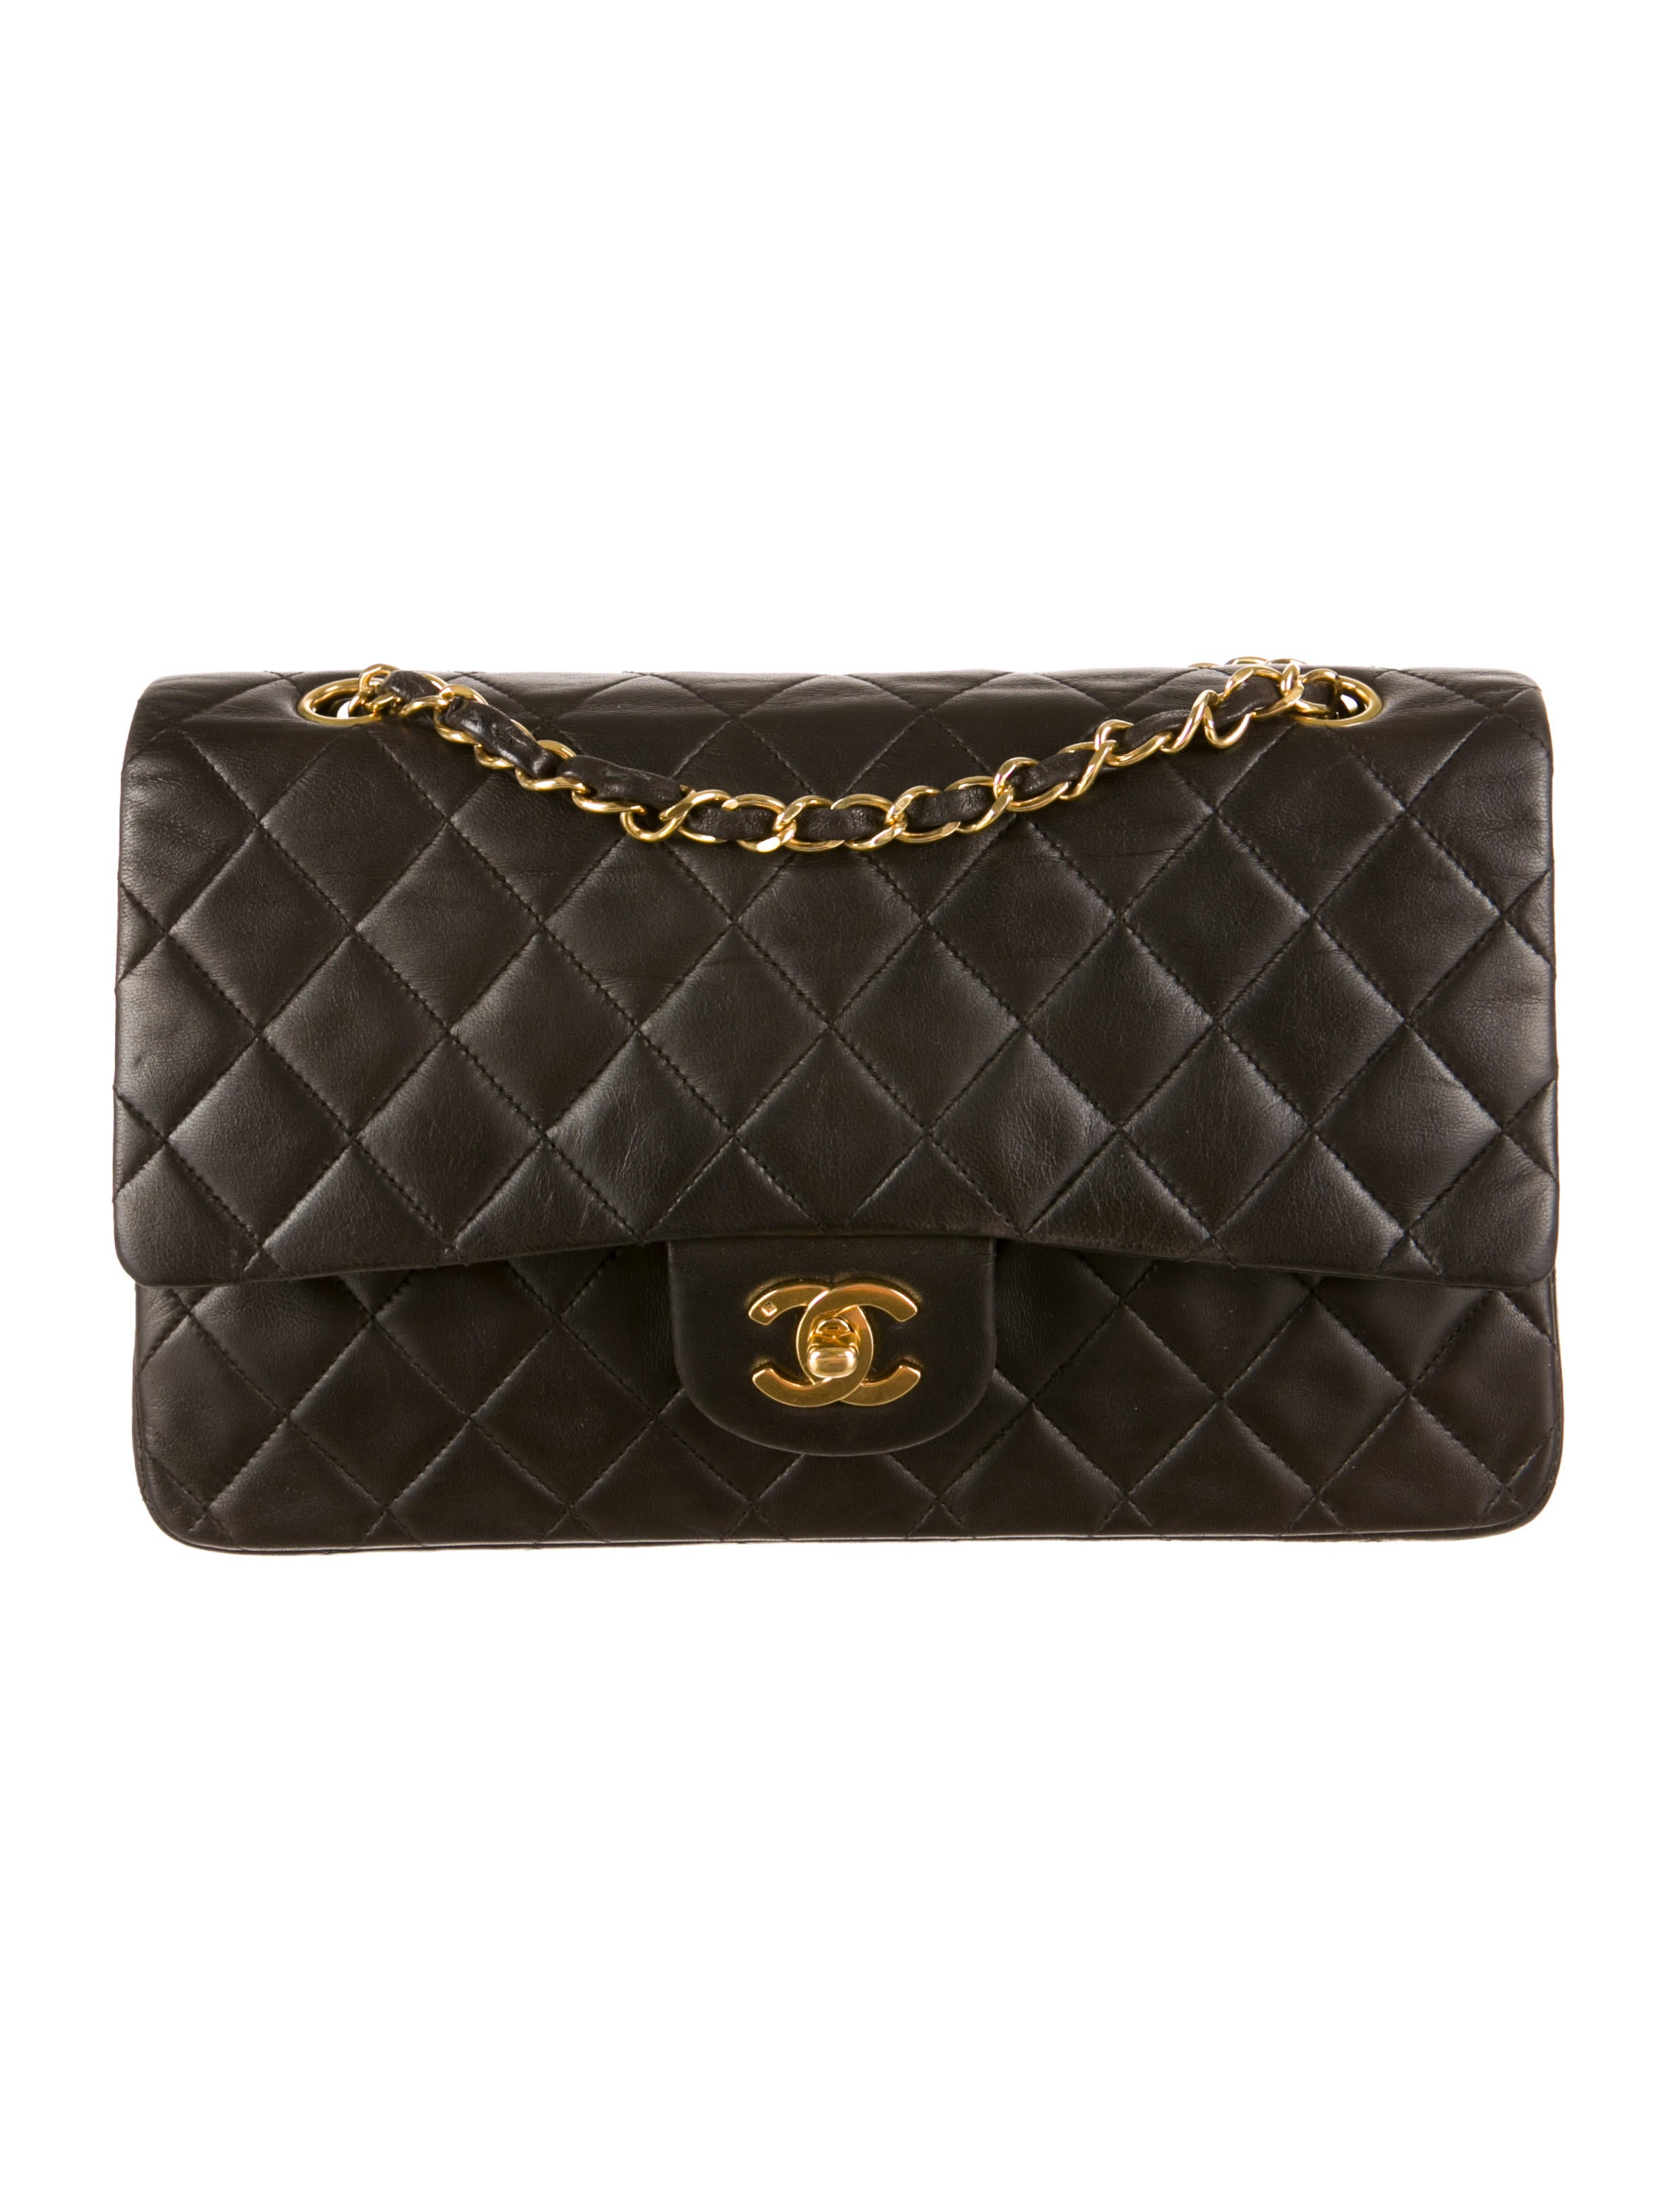 Chanel Vintage Small Lambskin Double Flap Bag Handbags